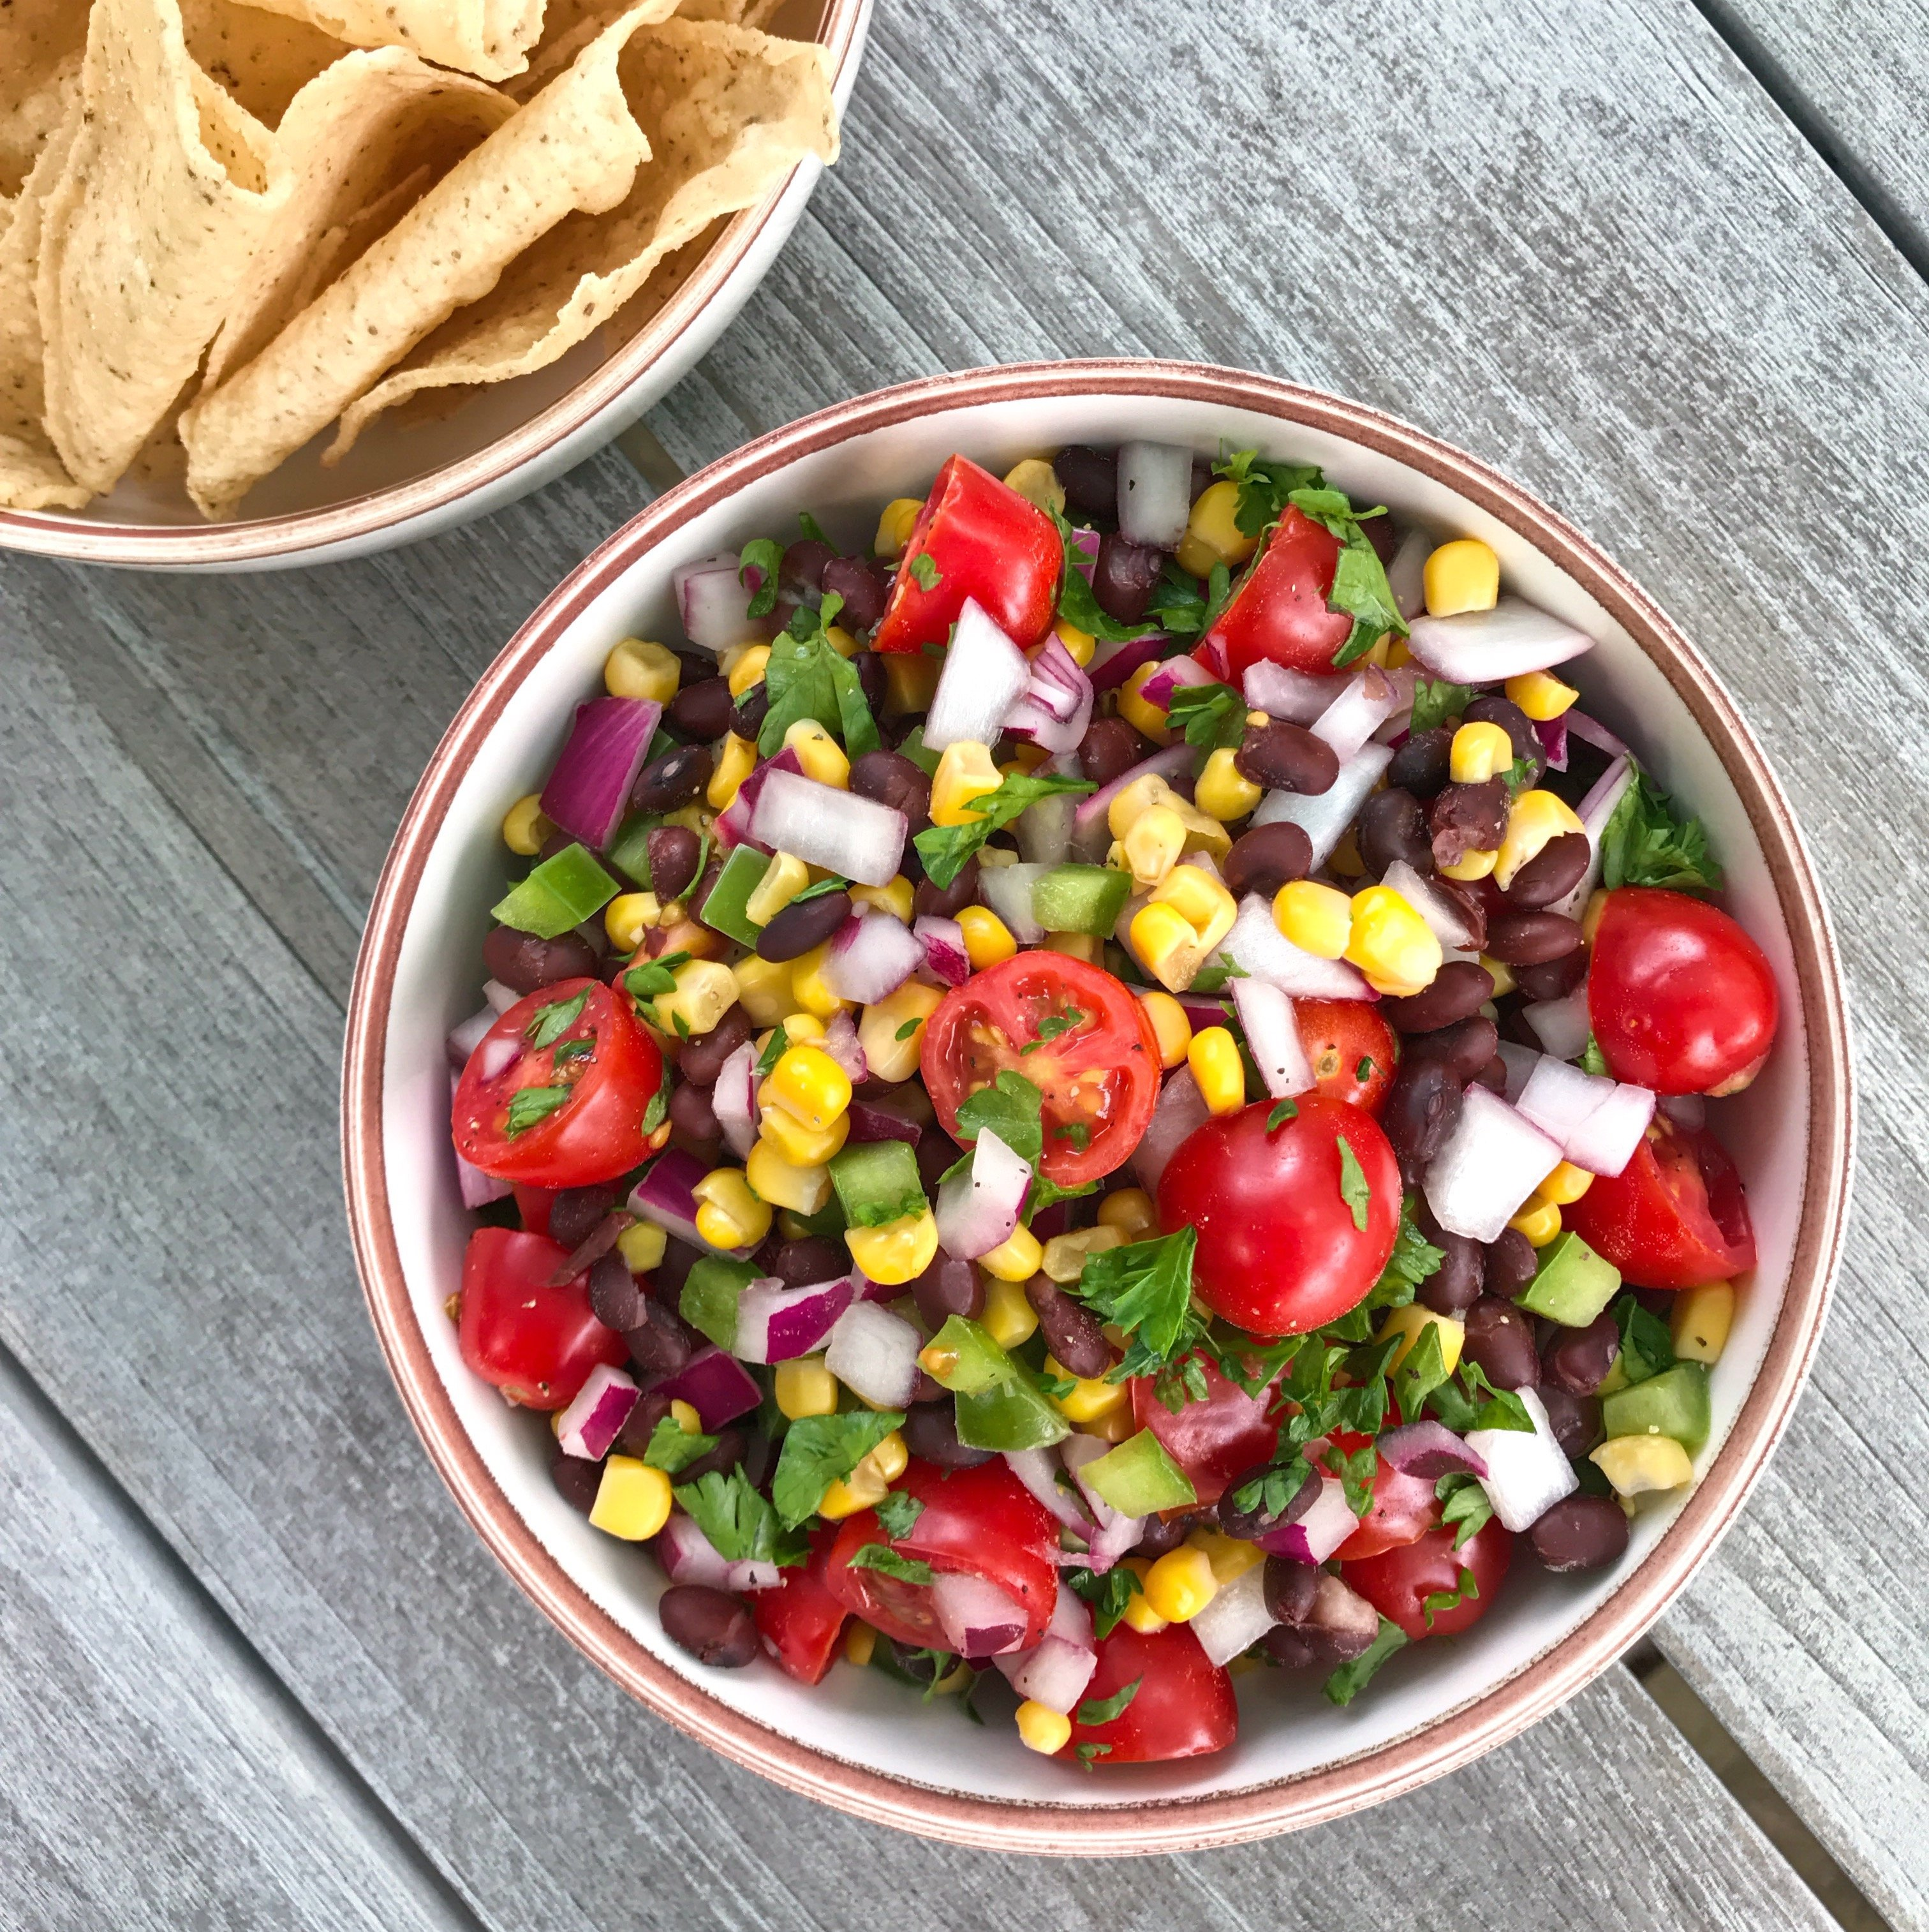 bLack bean salsa gluten free #glutenfreerecipes www.healthygffamily.com